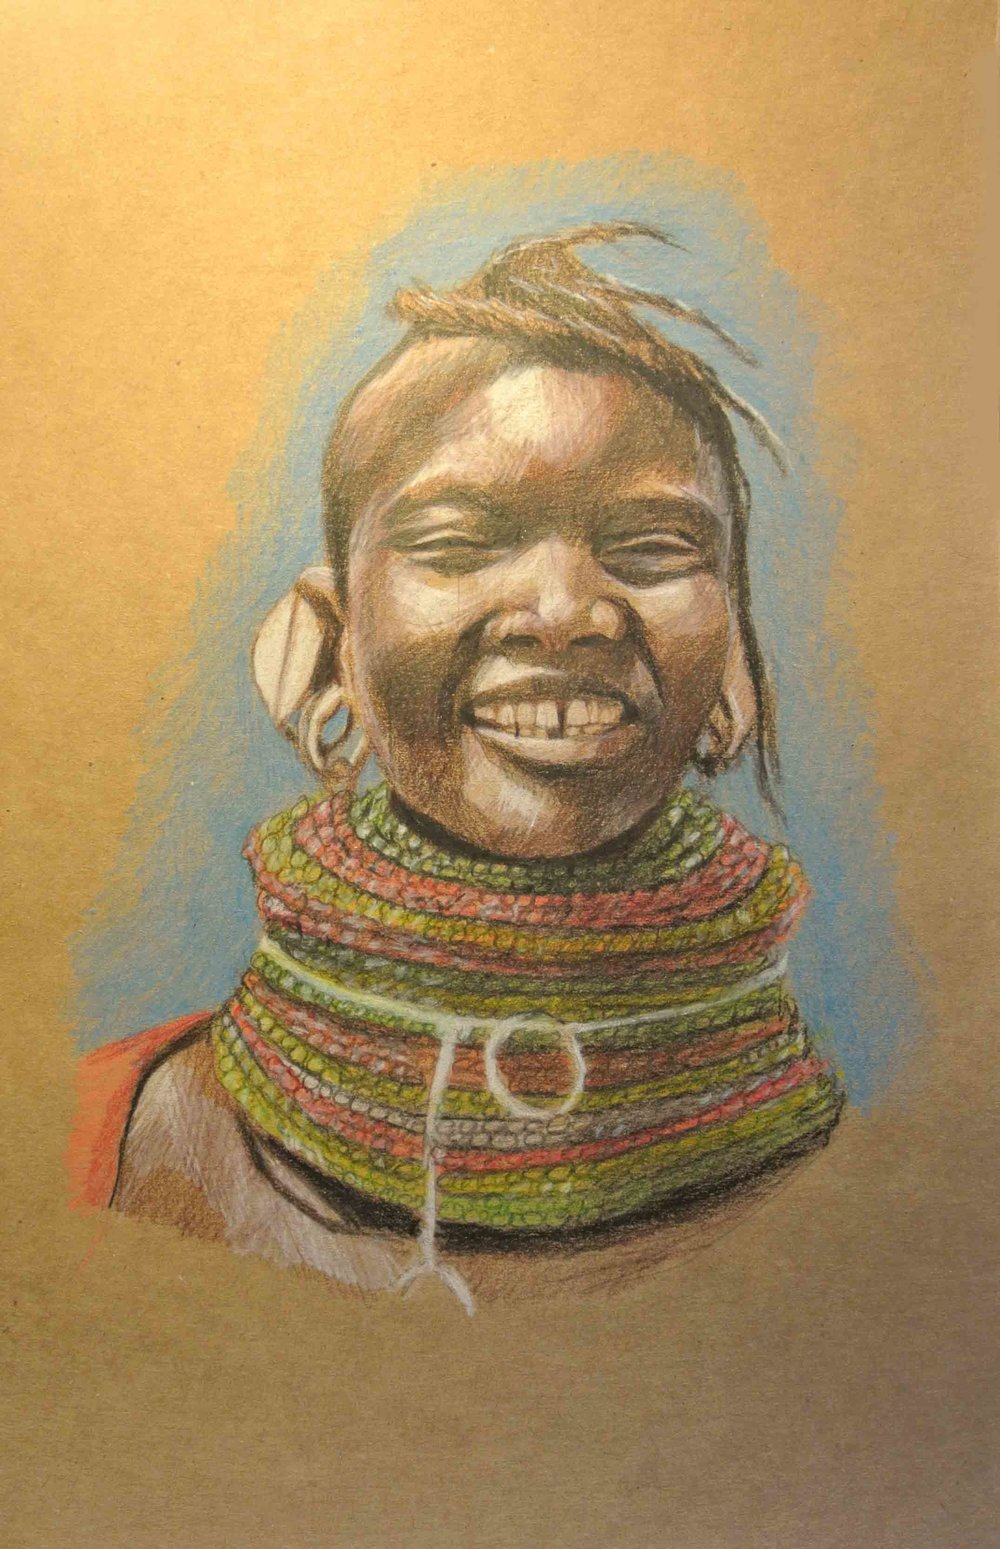 Tribal Sister